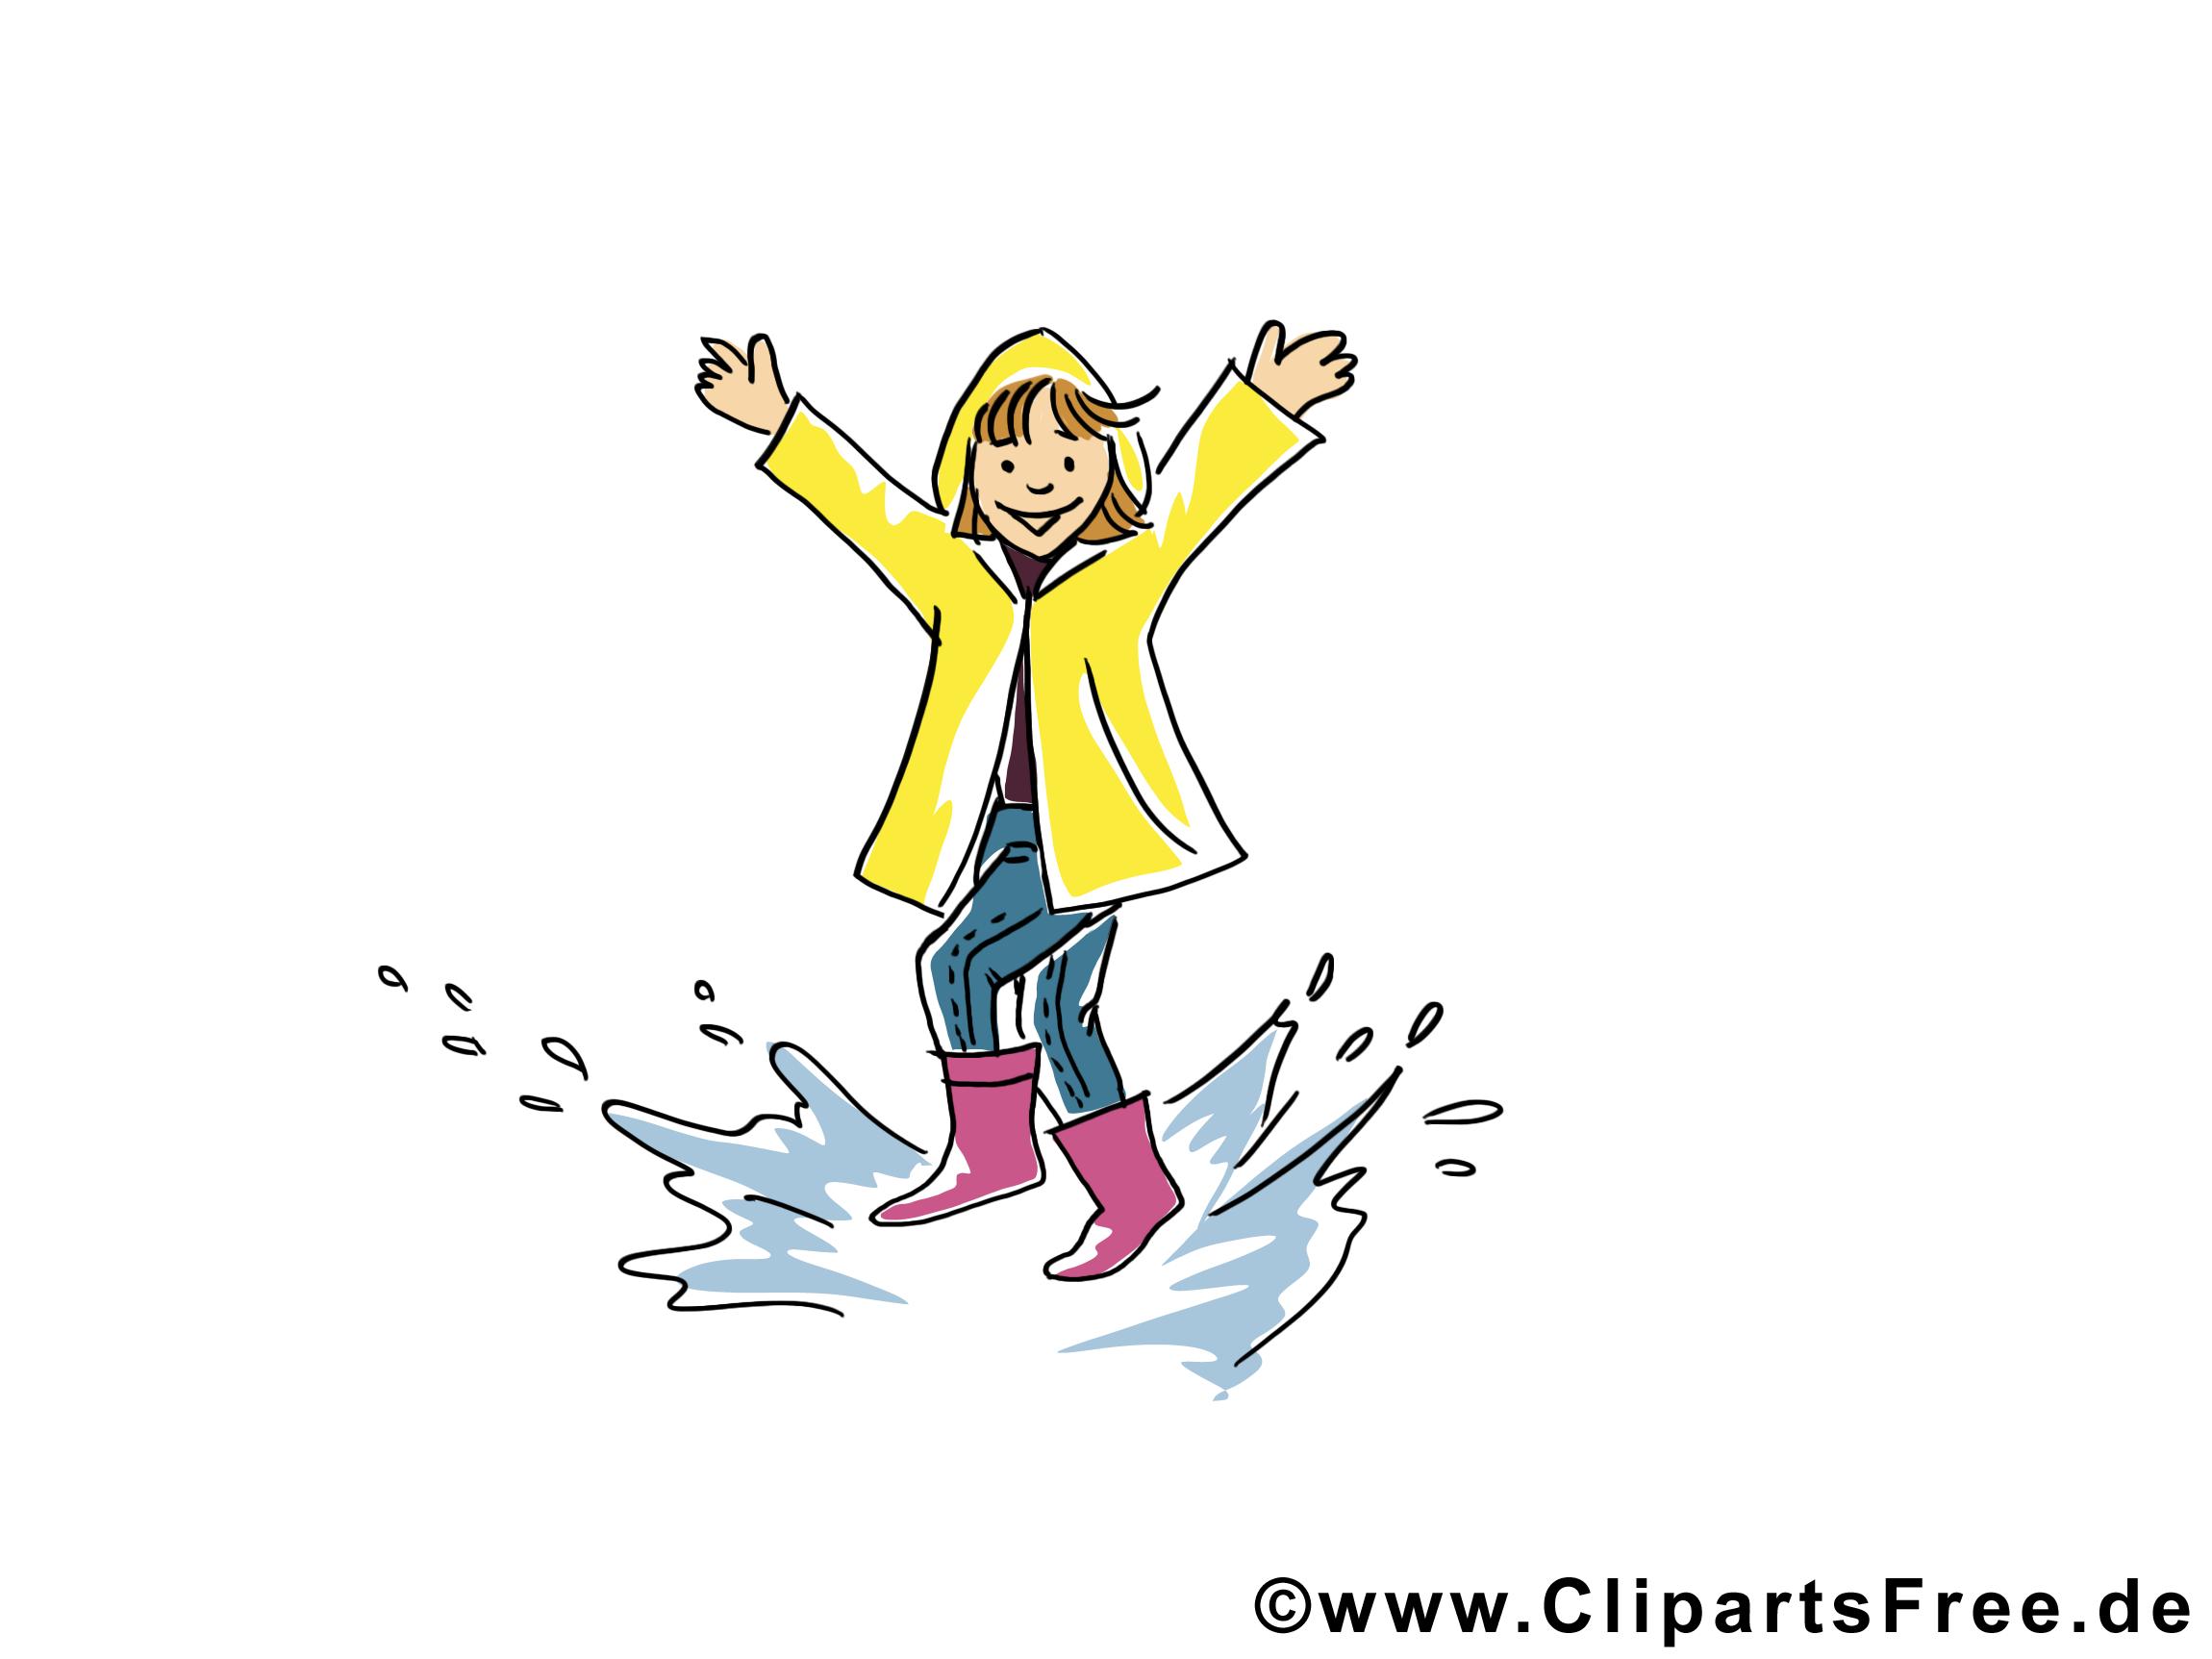 Flaque dessin gratuit – Automne image